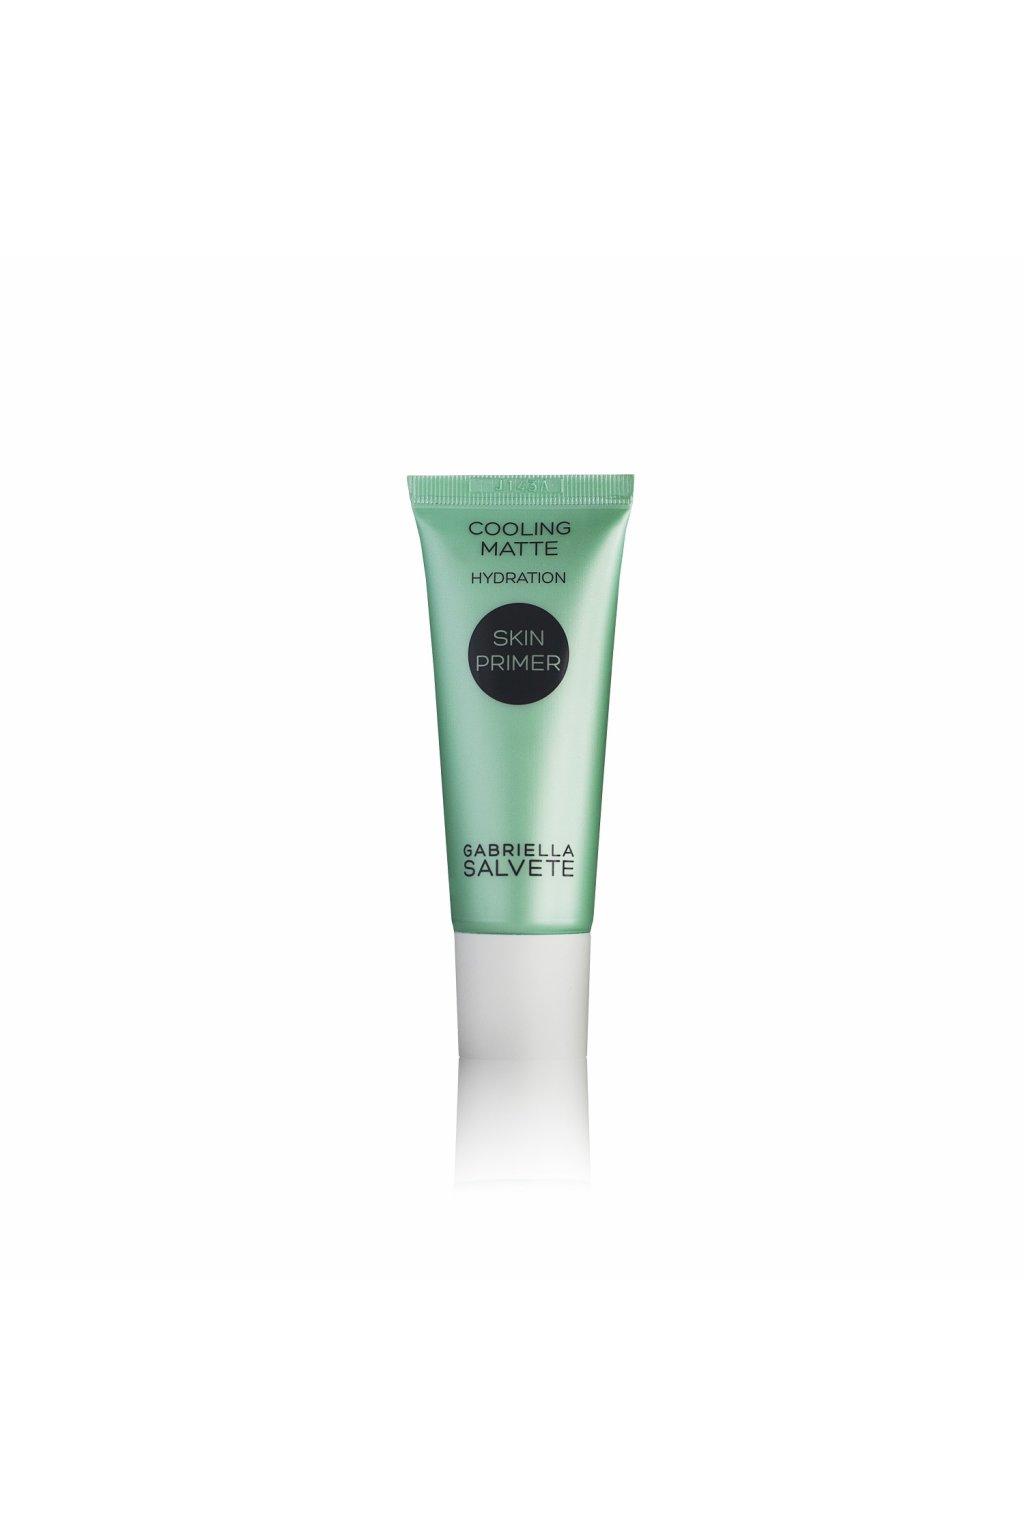 gabriella salvete skin primer cooling matte podklad pod makeup pro zeny 20 ml